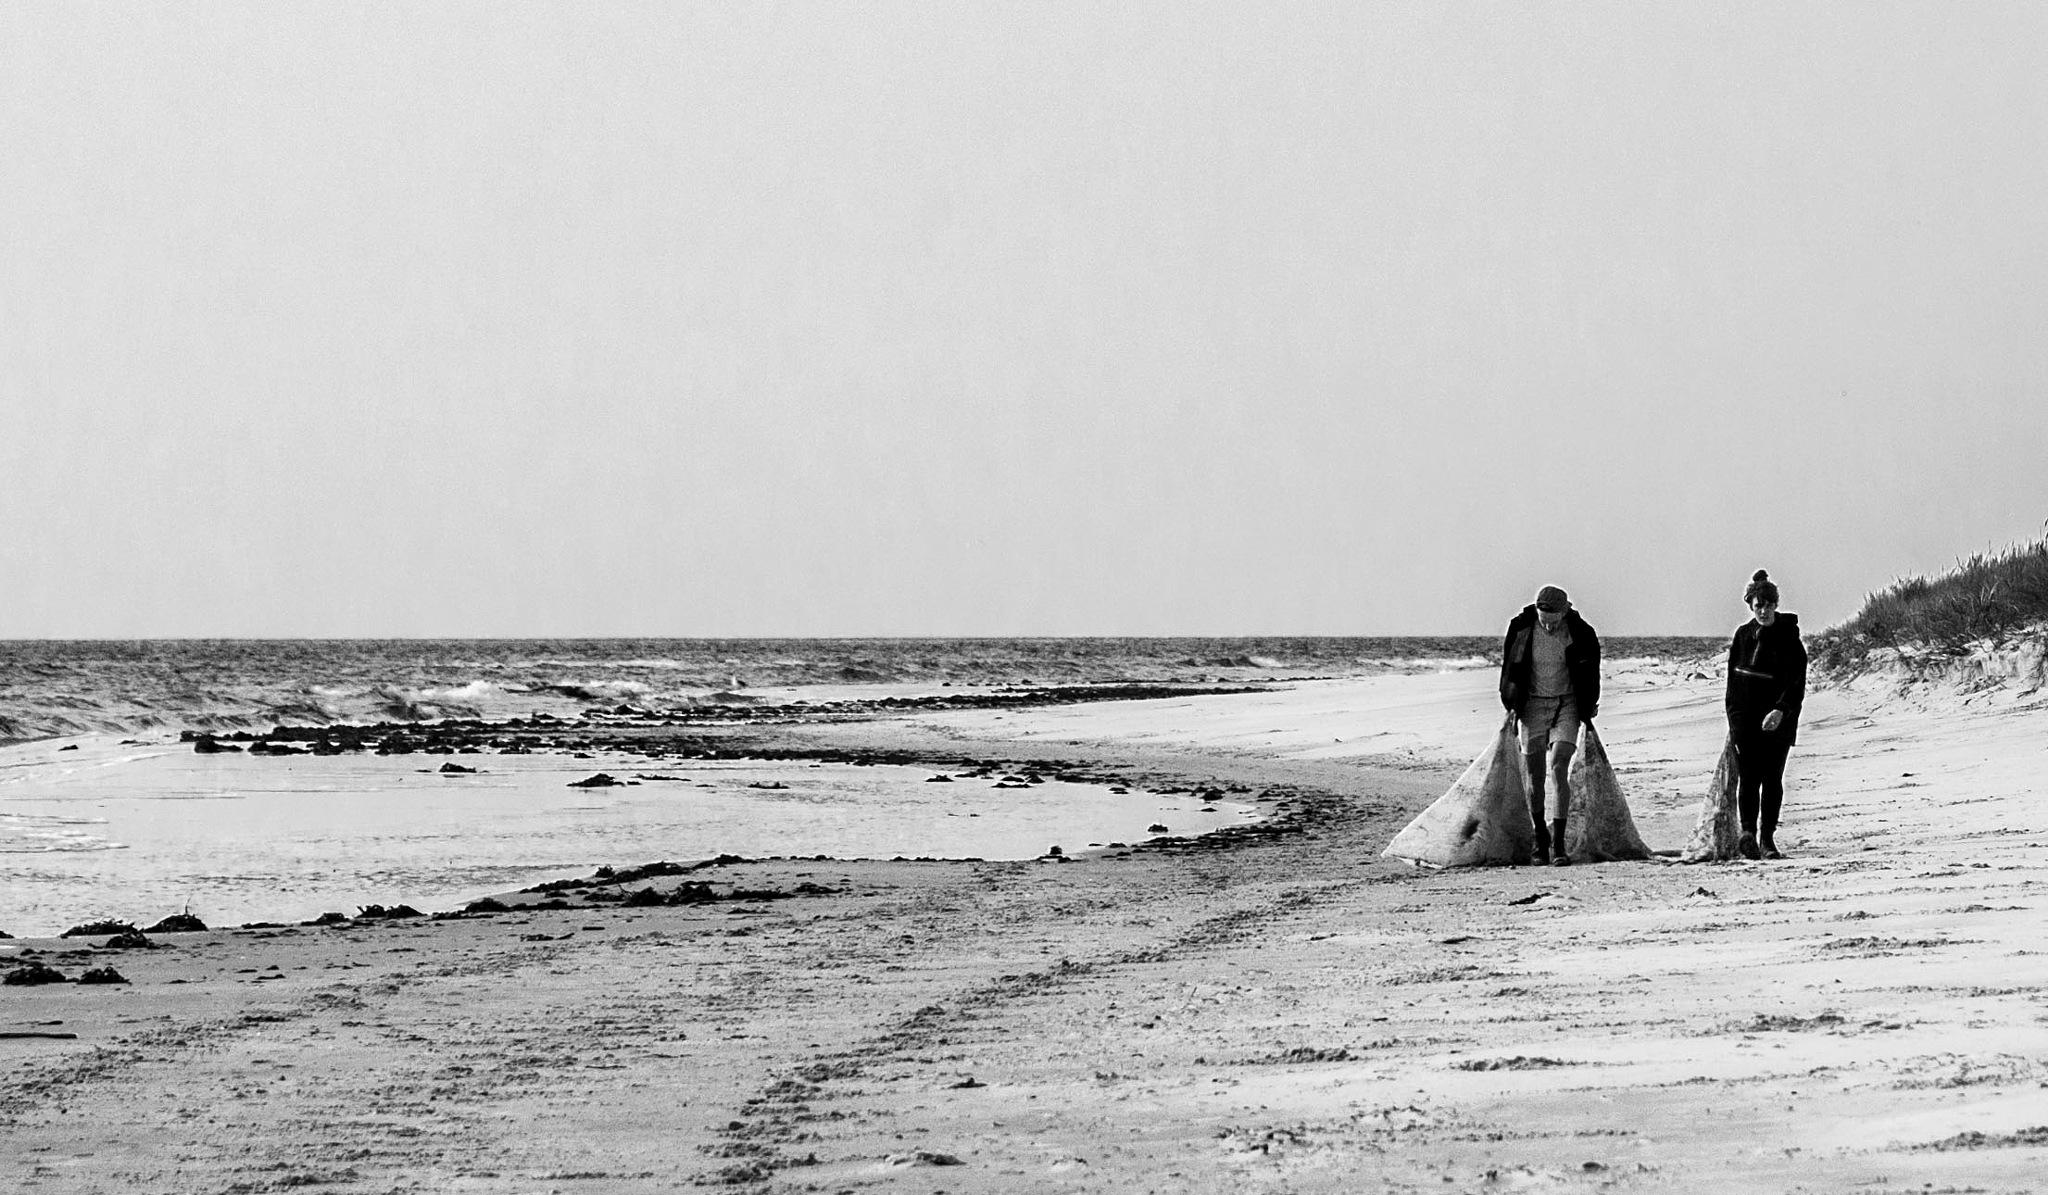 On the Beach by Rapsbollen